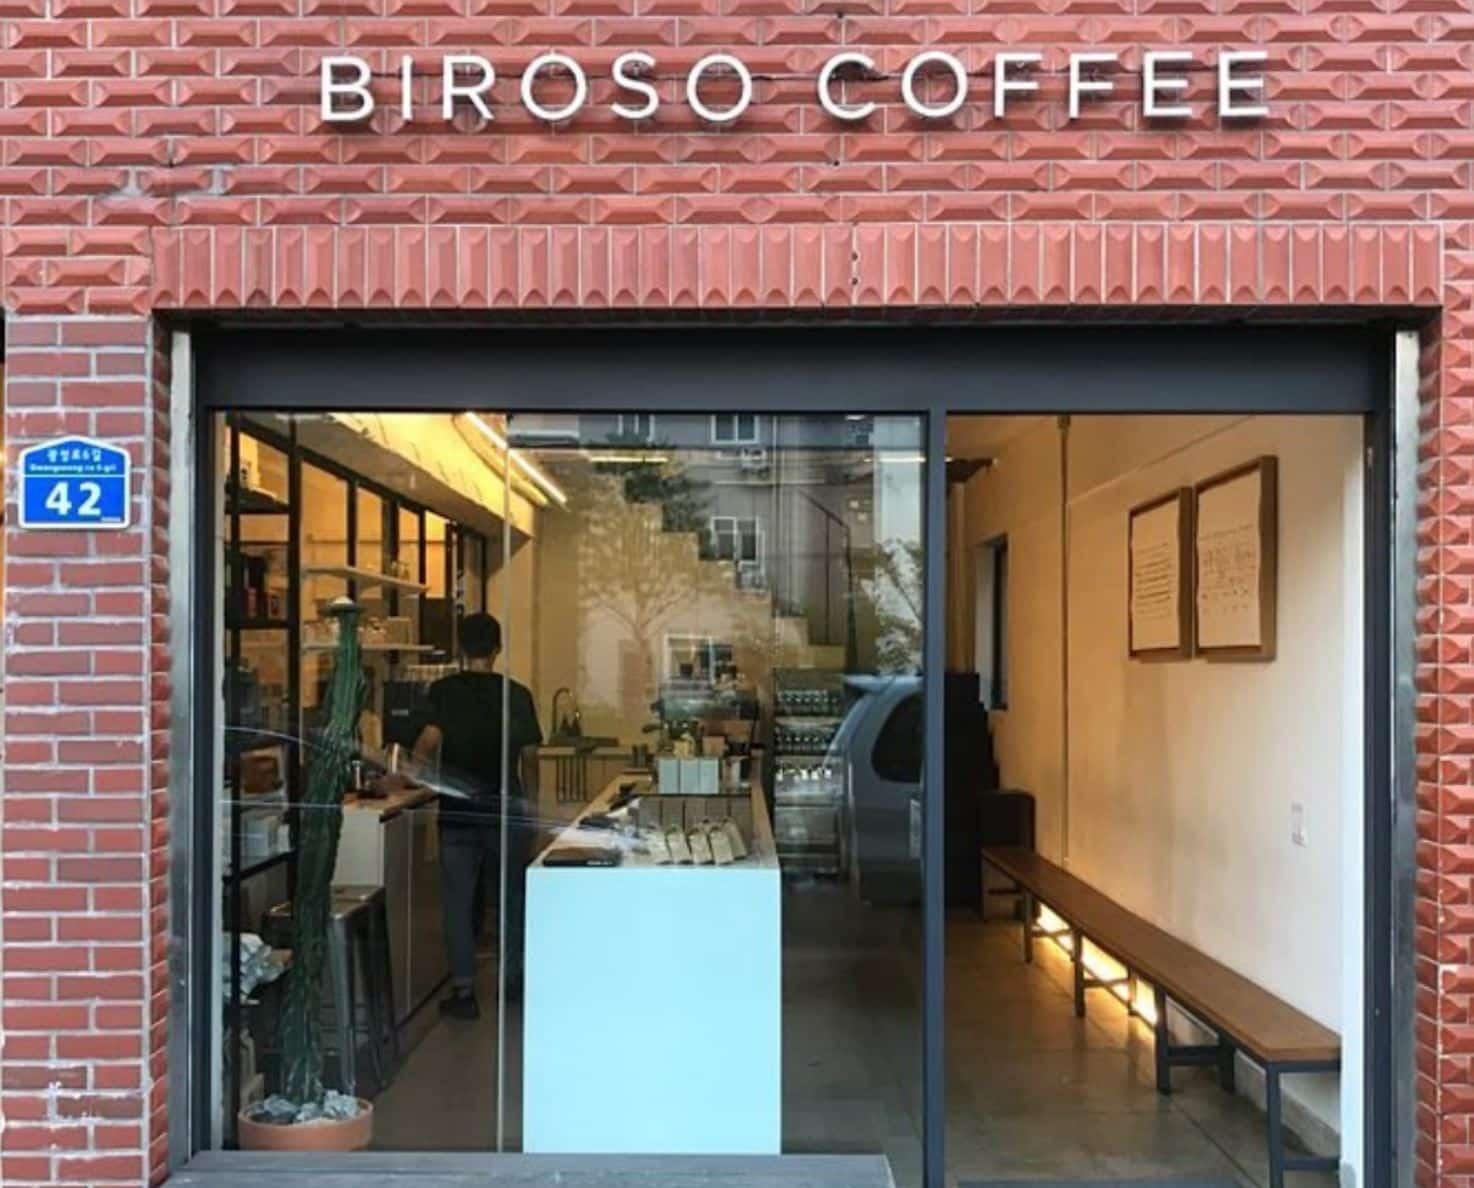 Biroso Coffee